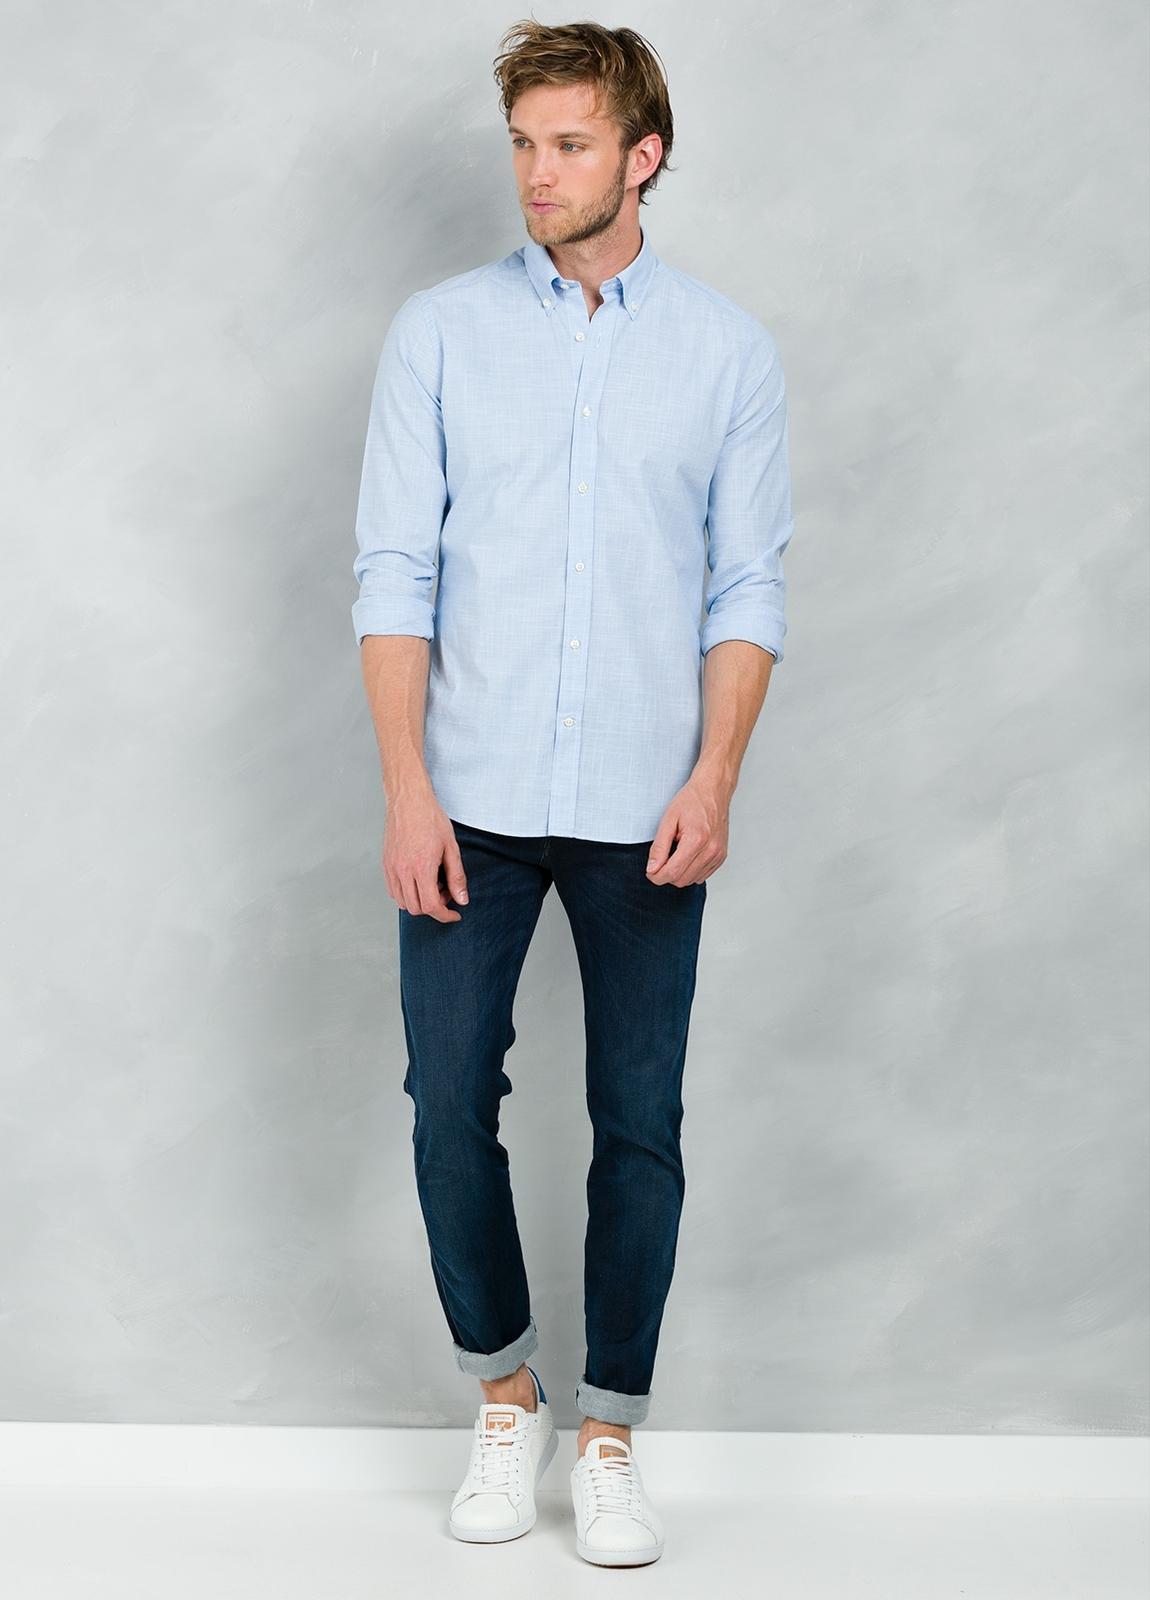 Camisa Casual Wear SLIM FIT Modelo BUTTON DOWN dibujo pata de gallo color celeste, 100% Algodón.